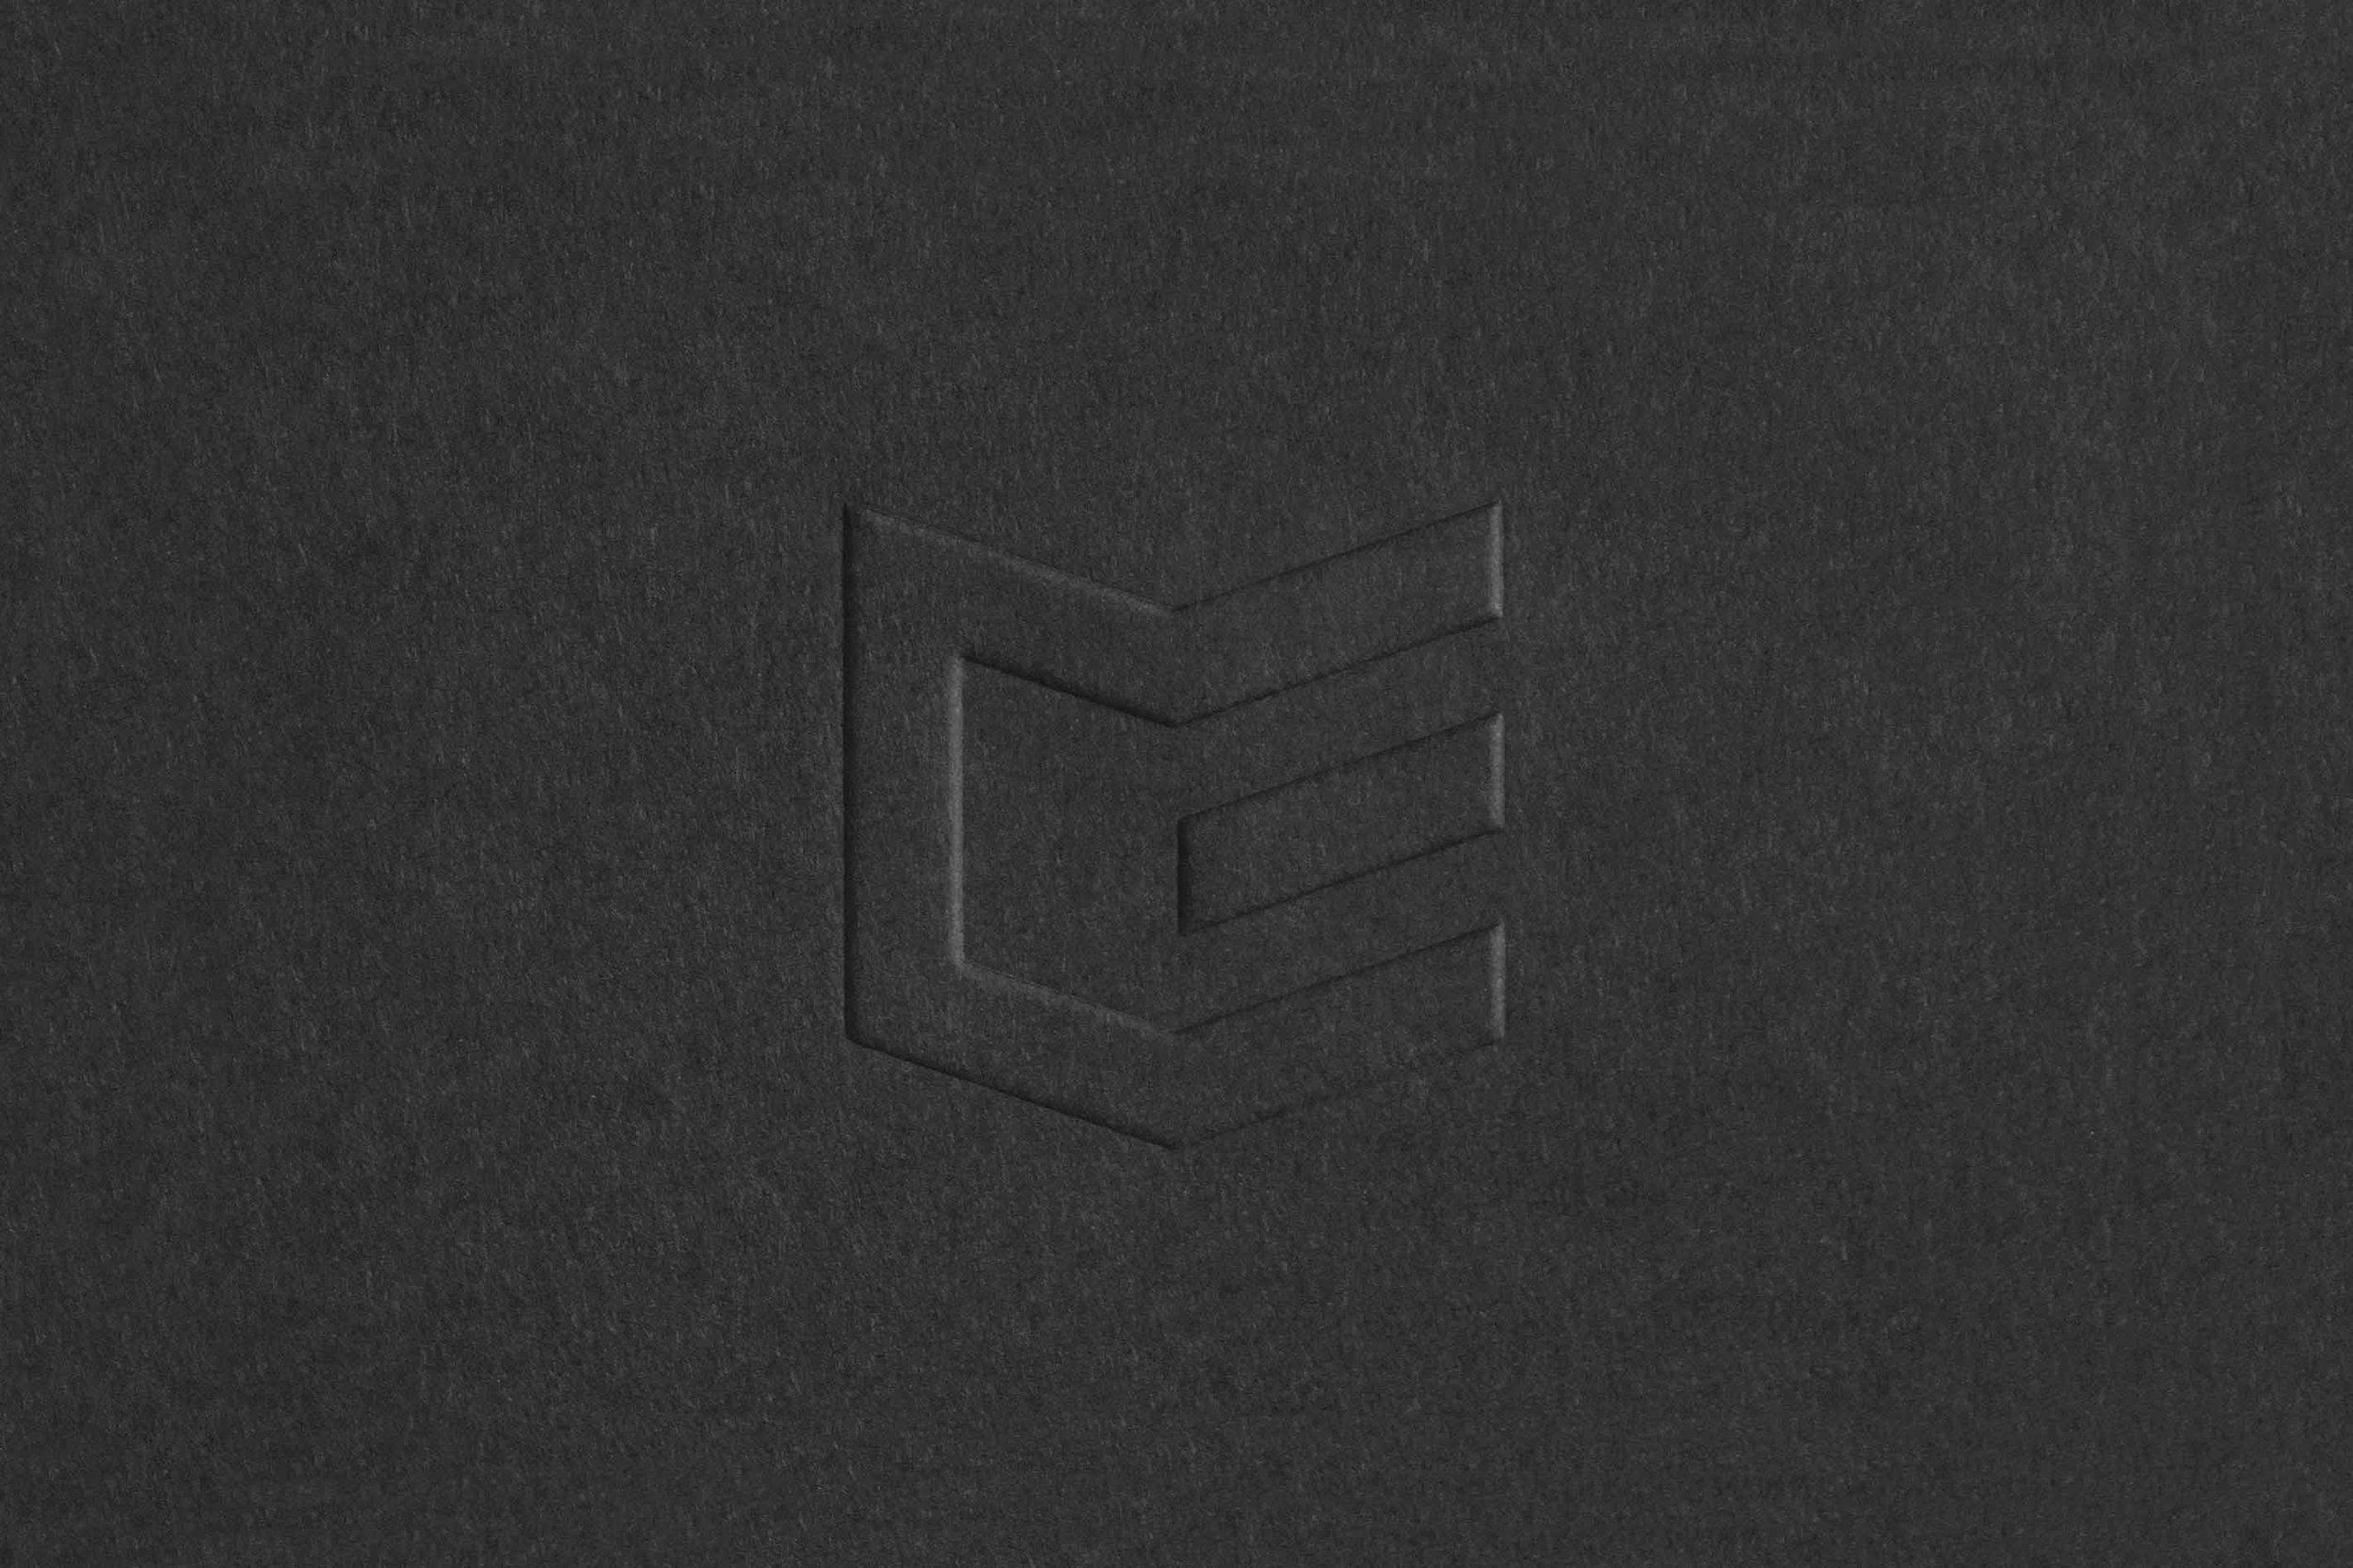 Figure-Jeremy-Hall-Design-Graphique-Quebec-Logo-Branding-Image-De-Marque-Item-Construction-1.jpg